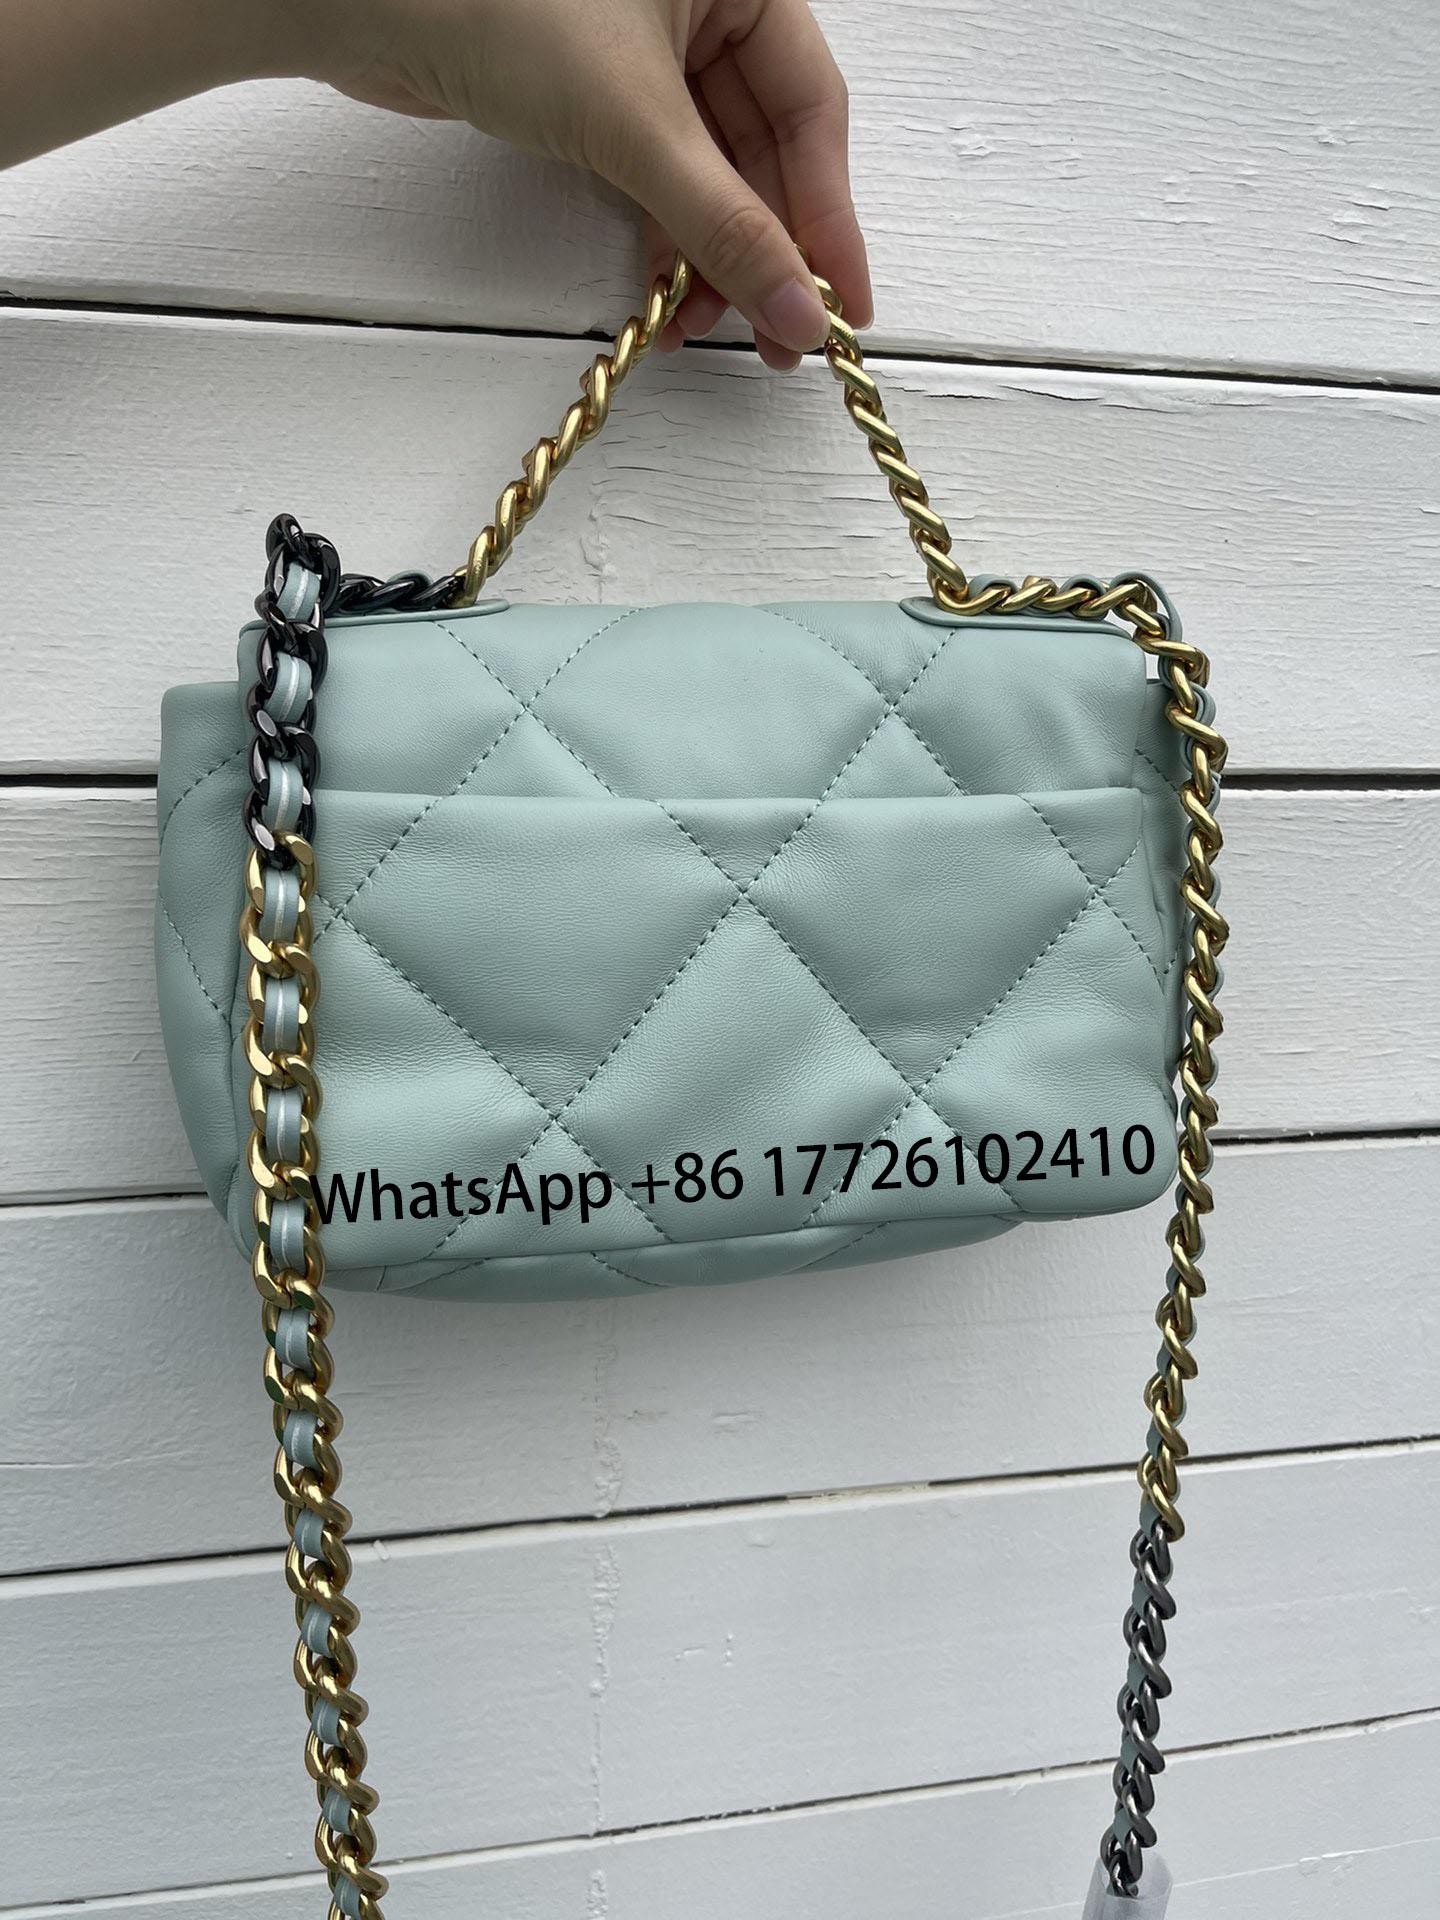 Crossbody Bags Luxury Women Brand Handbags Many Colors Female Bag Women's Shoulder Bag Imported  Leather Chain Flap Bag